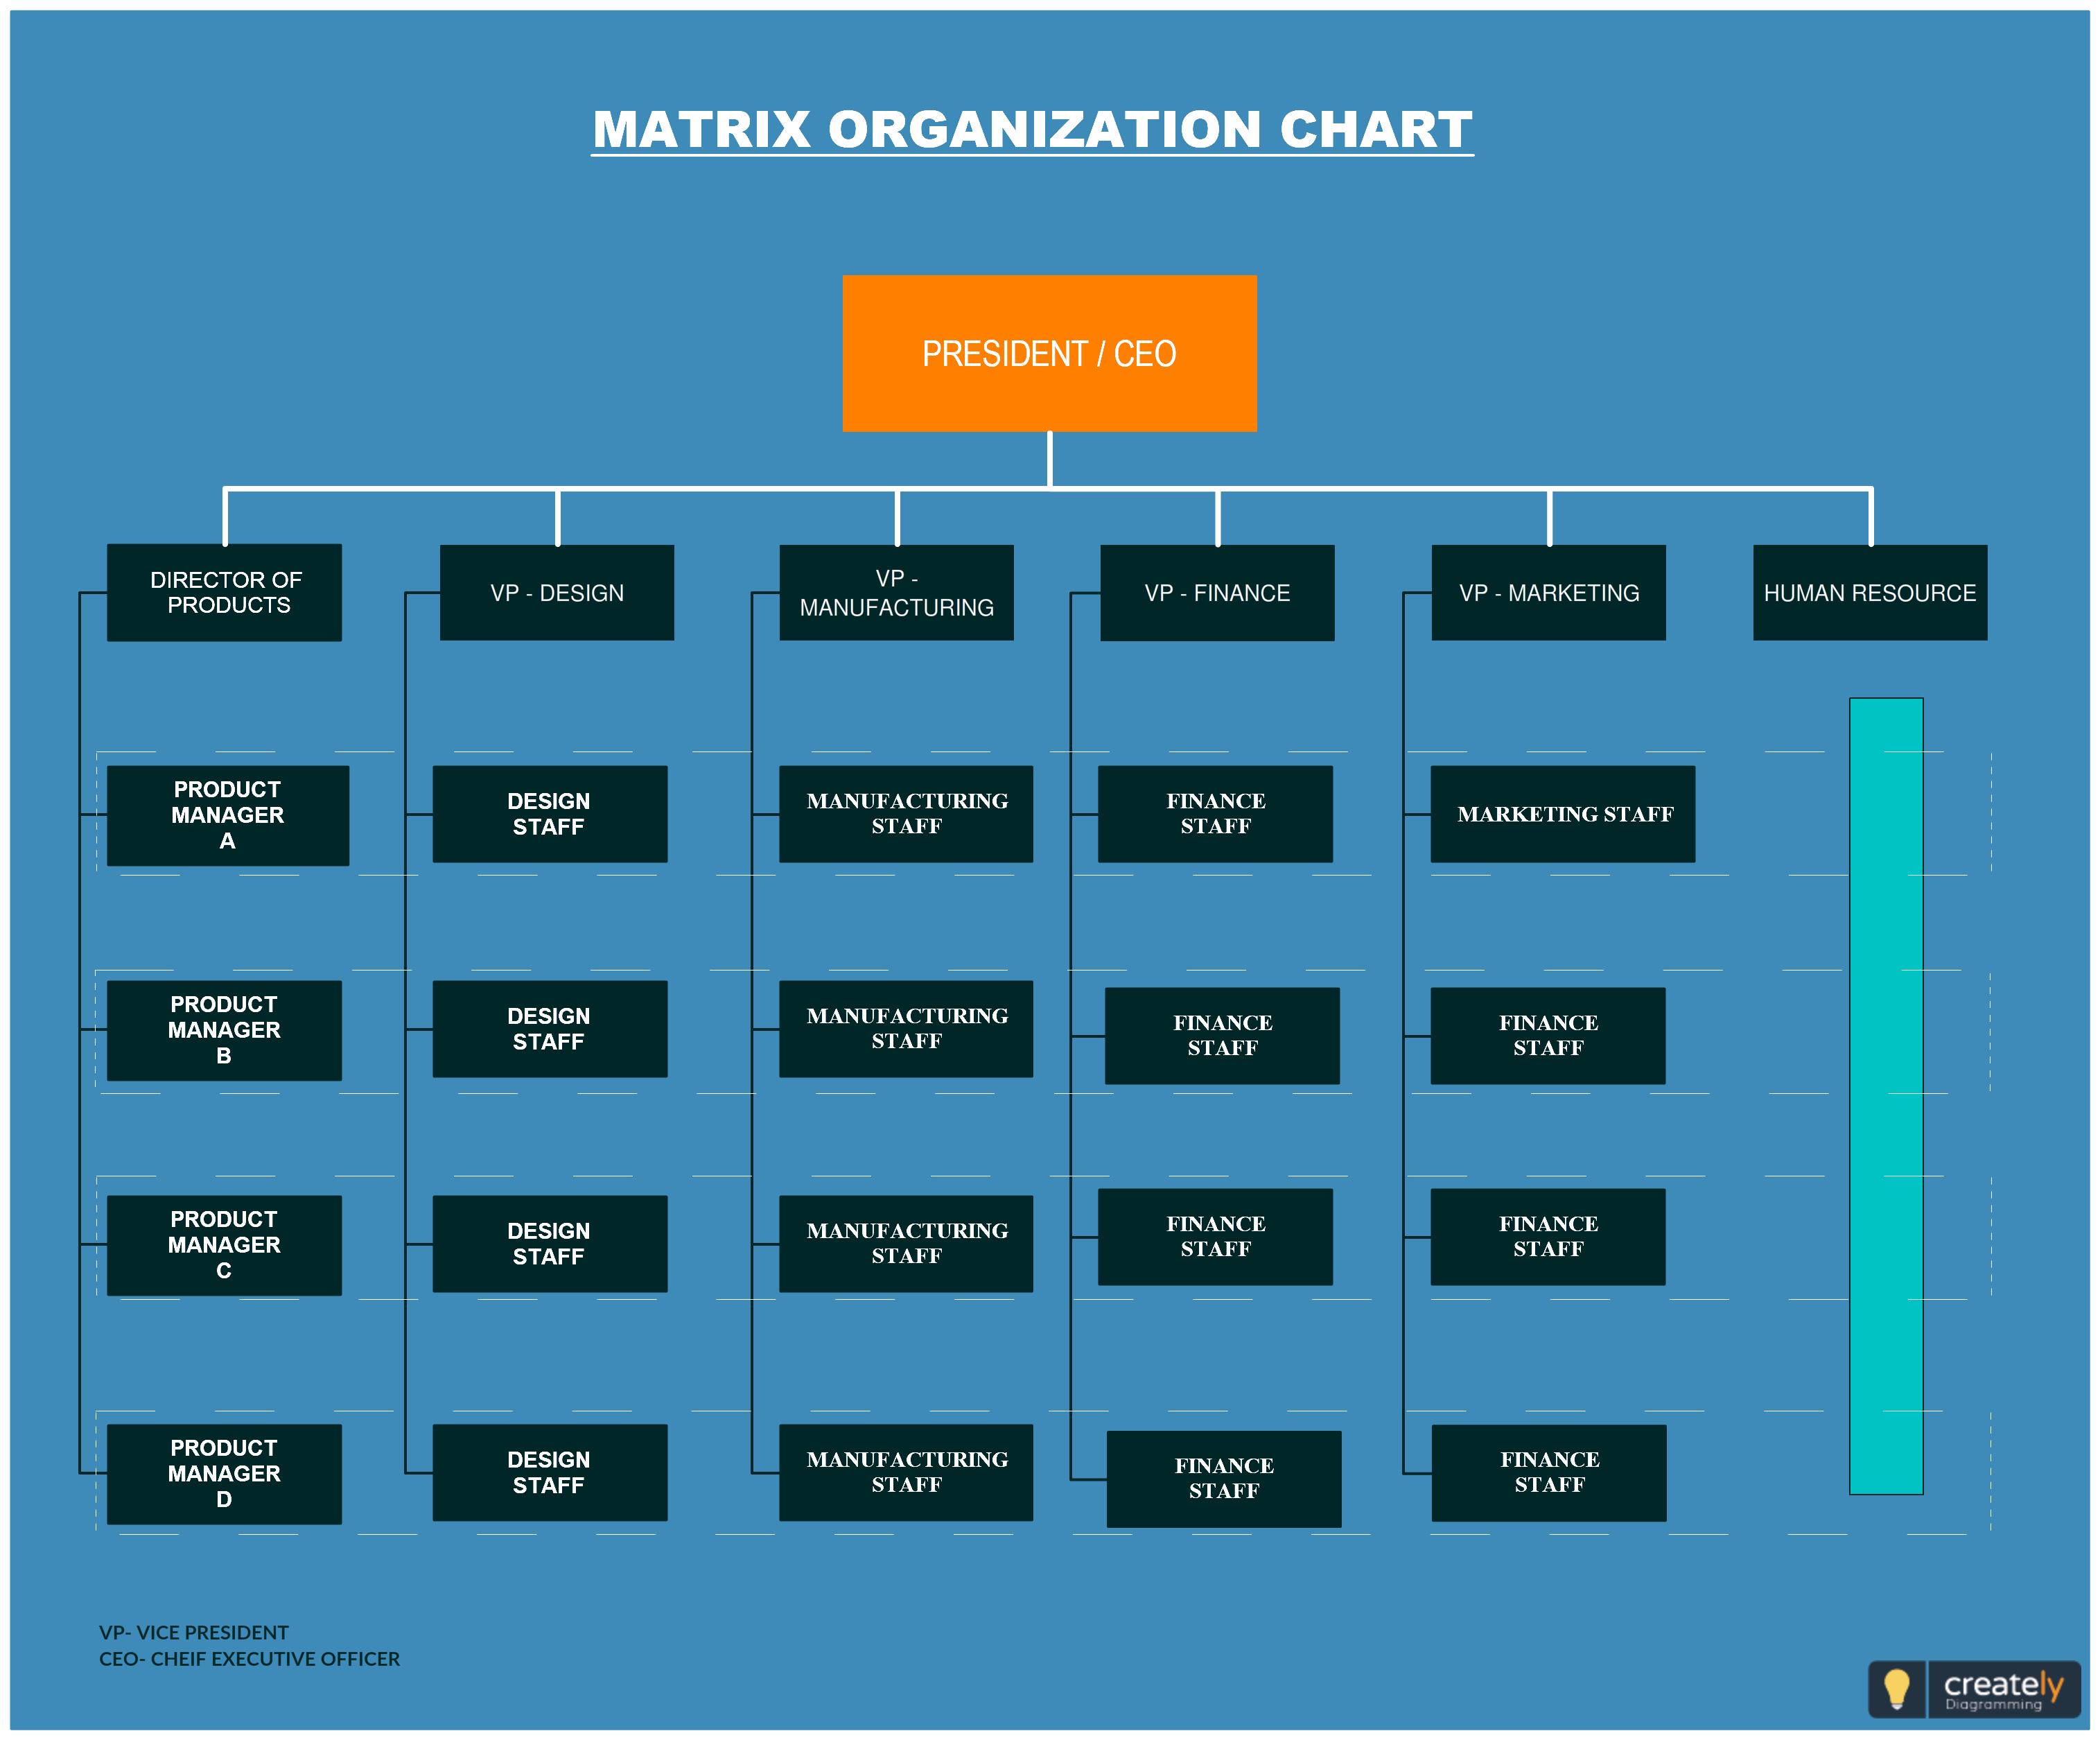 8 Best Matrix Organization Chart Templates Ideas Organization Chart Organizational Structure Matrix